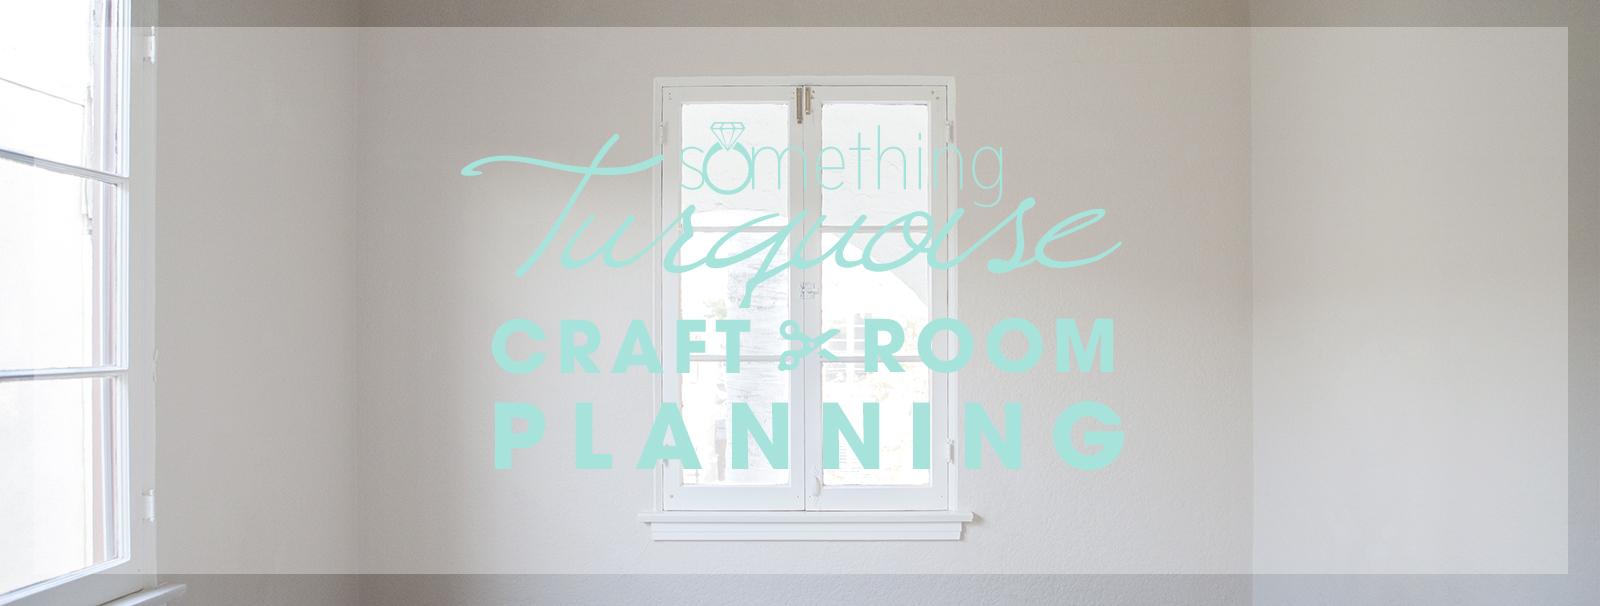 #STcraftroom - Part One - Planning